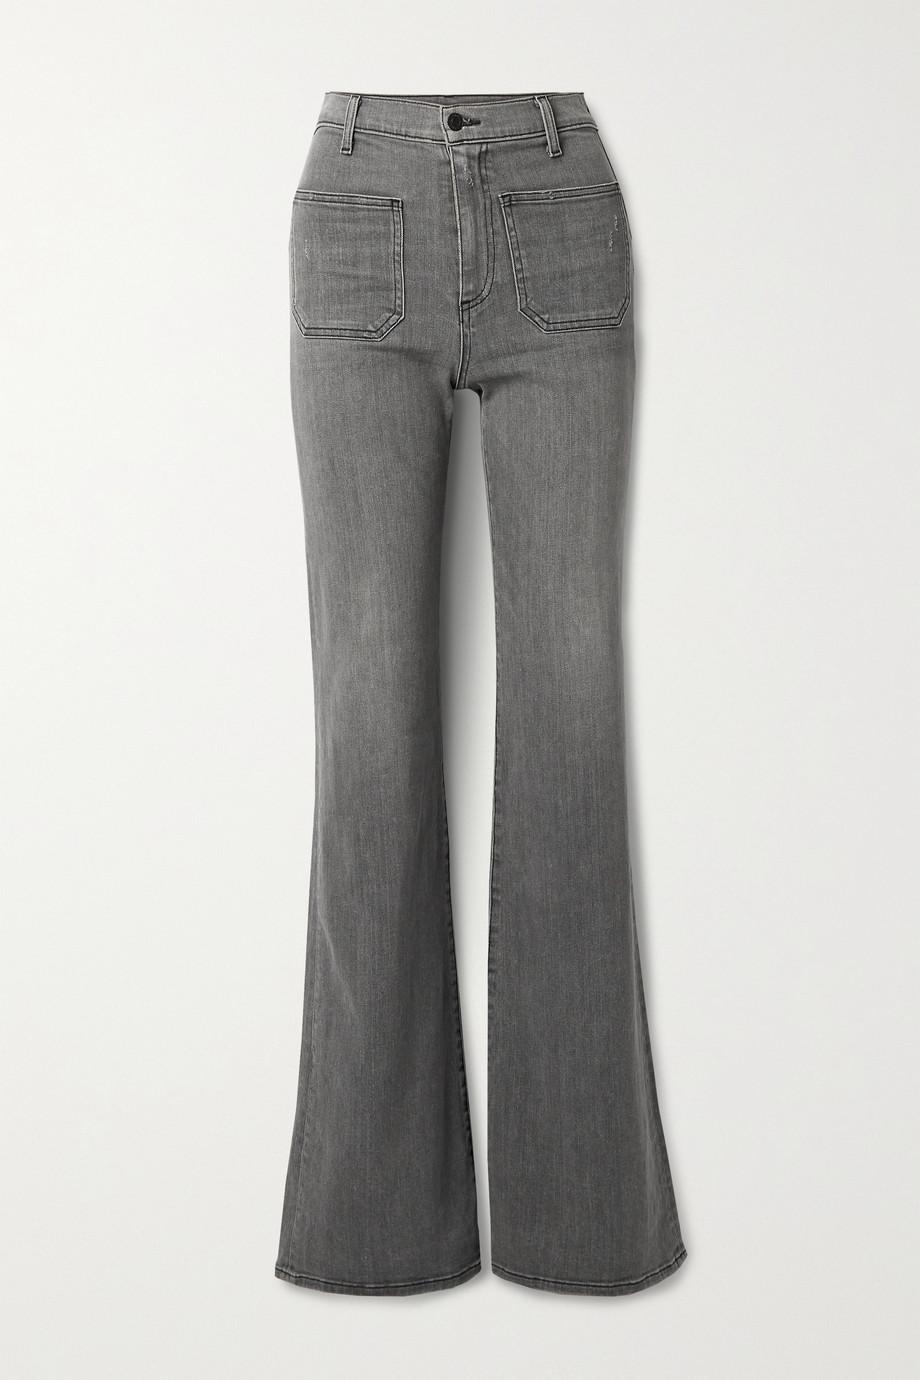 Nili Lotan Florence distressed high-rise flared jeans